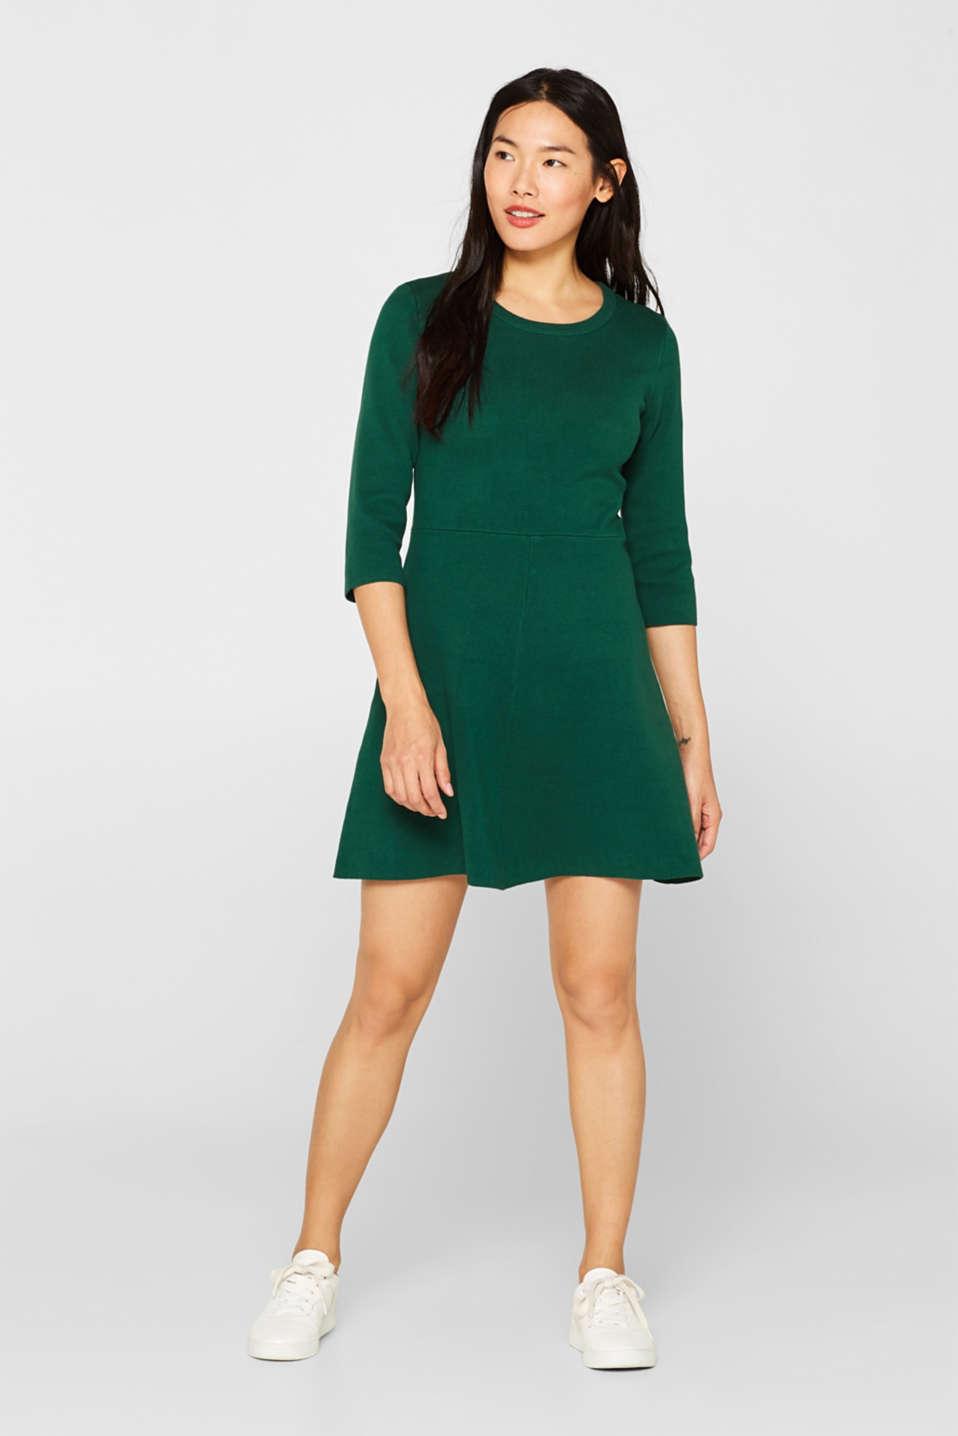 Dresses flat knitted, BOTTLE GREEN, detail image number 1